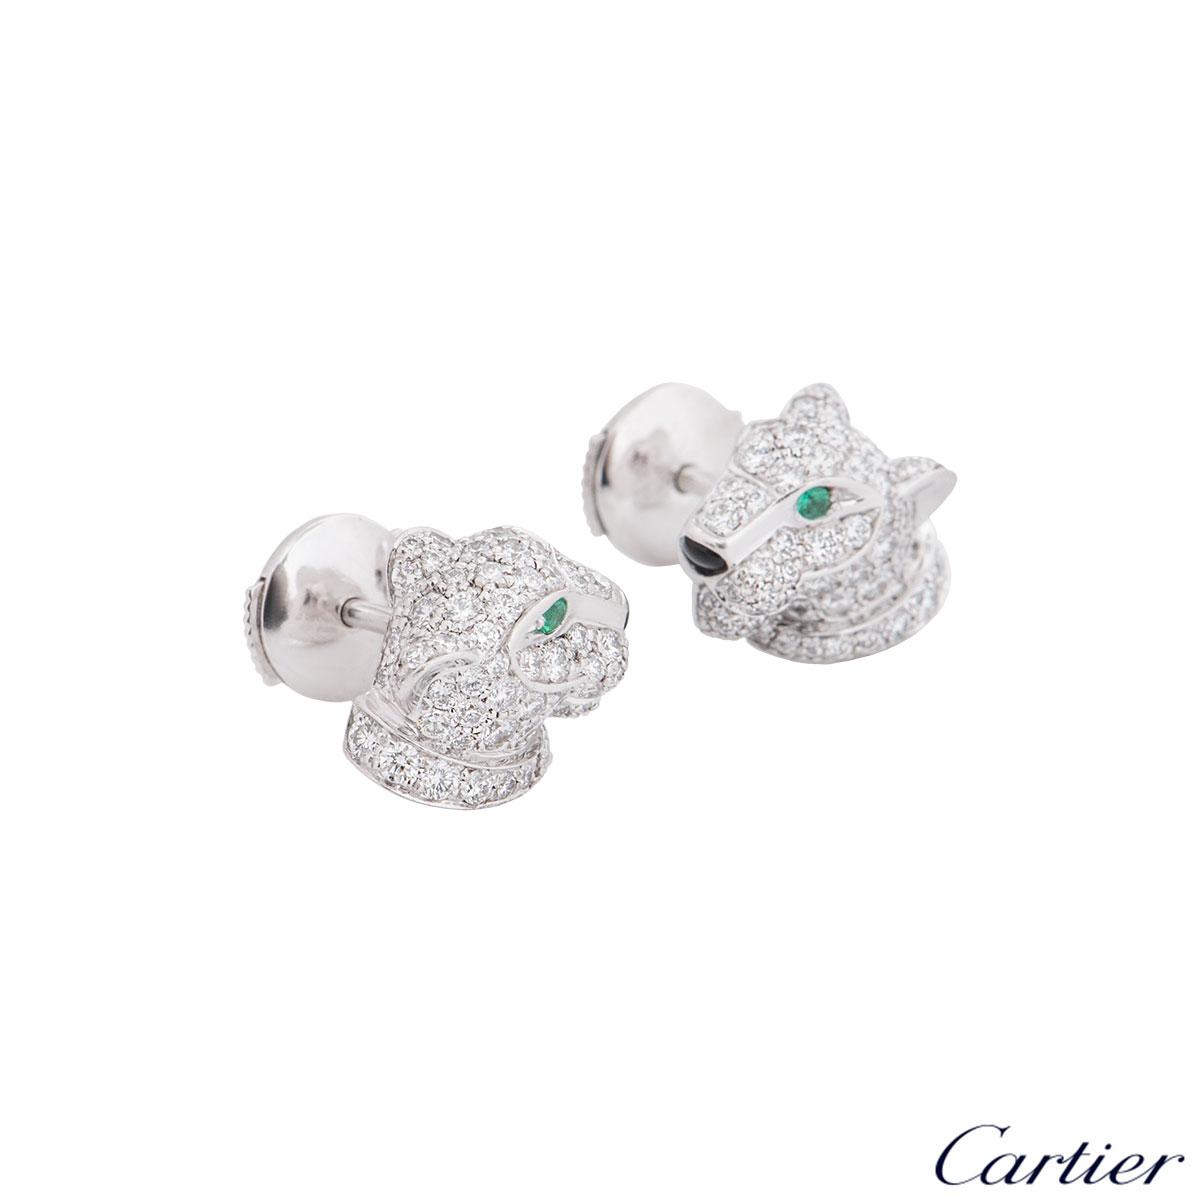 Cartier White Gold Panthere De Cartier Earrings N8050700